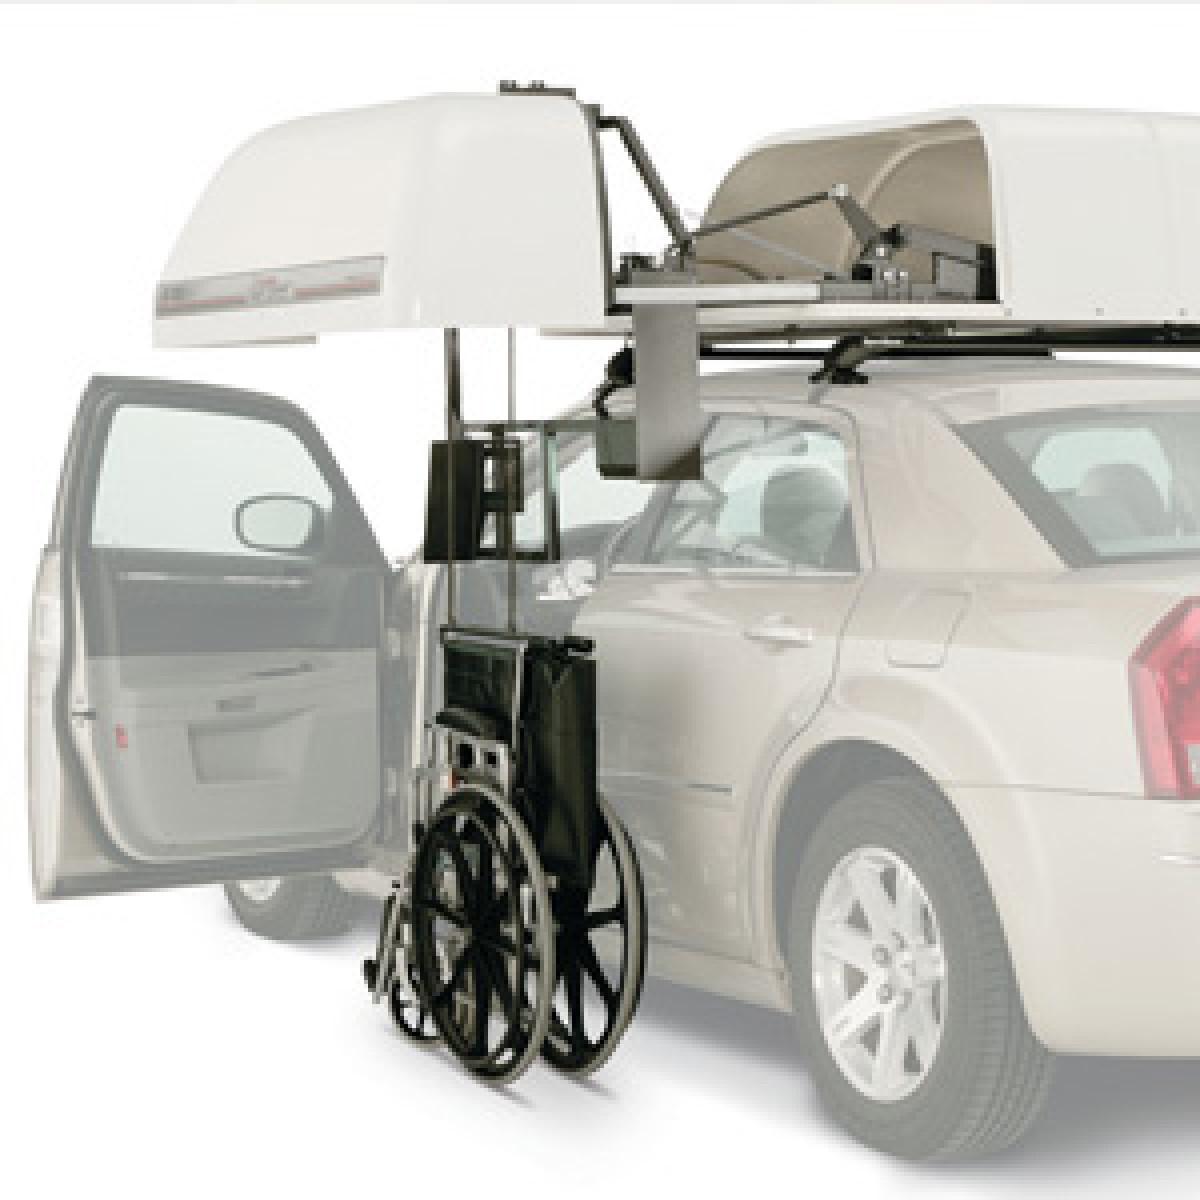 wheelchair lift cost xbox one racing chair braun topper manual blvd